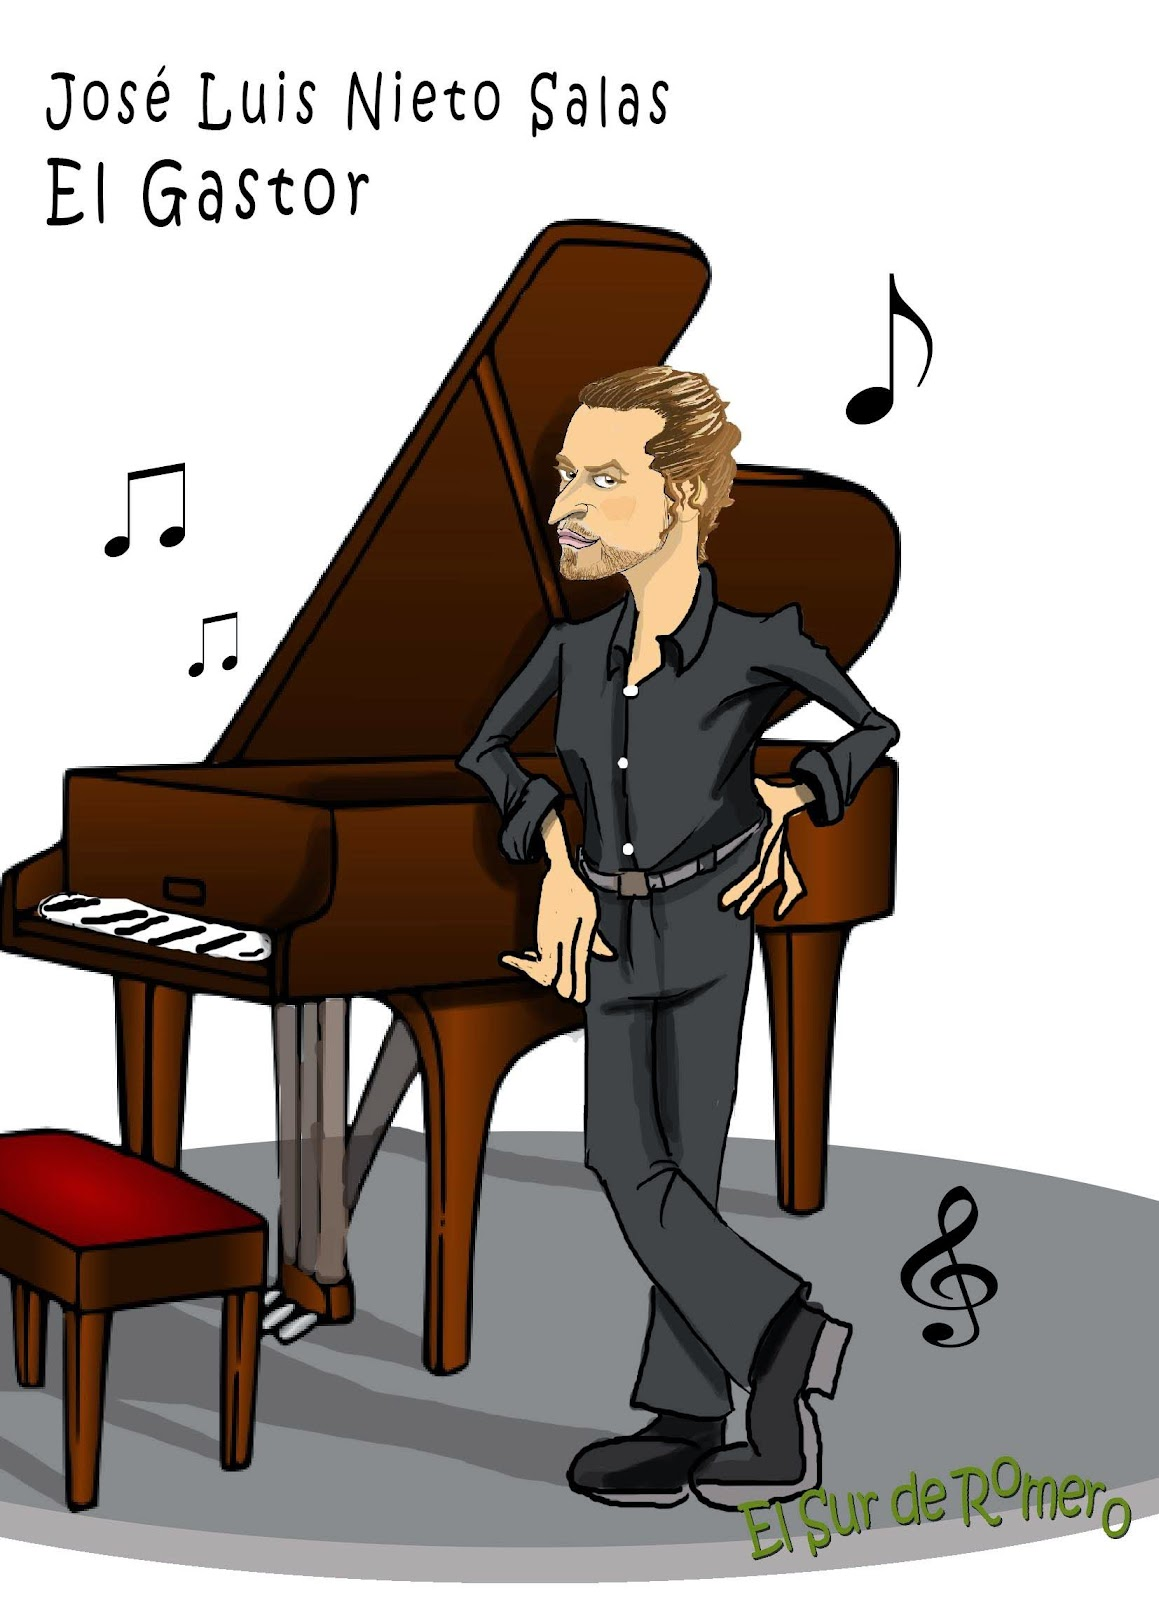 "<img src=""Nieto Salas.jpg"" alt=""pianista en dibujo""/>"